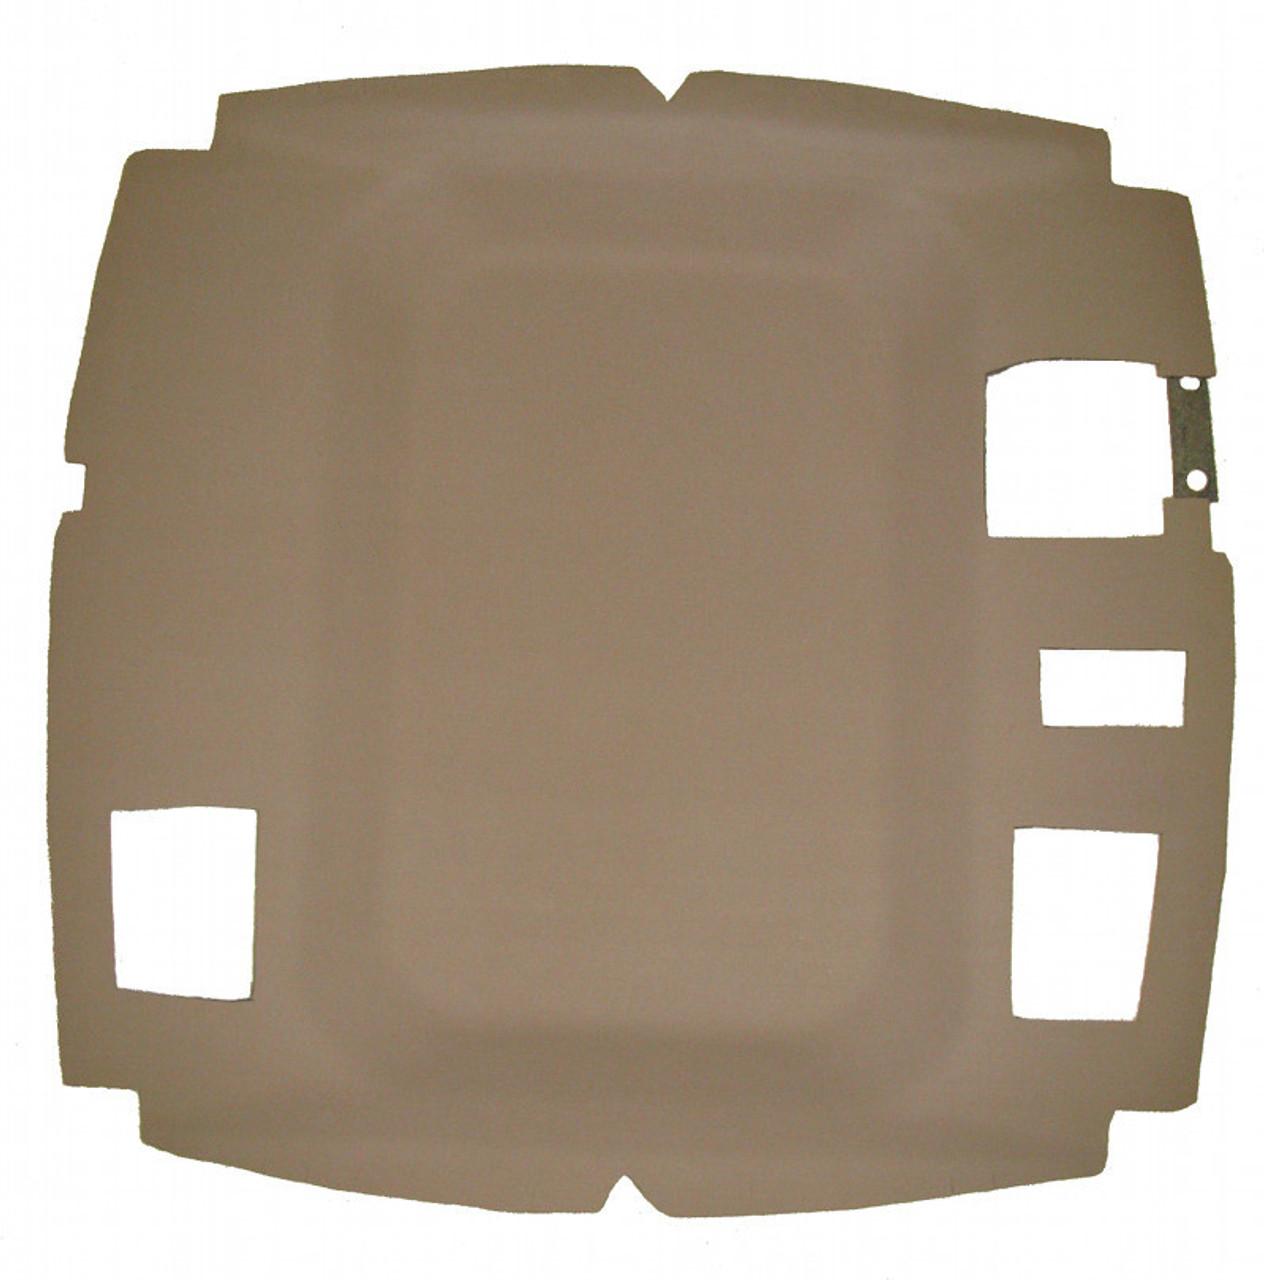 John Deere Cab Upholstery – John Deere 4755 Fuse Panel Diagram